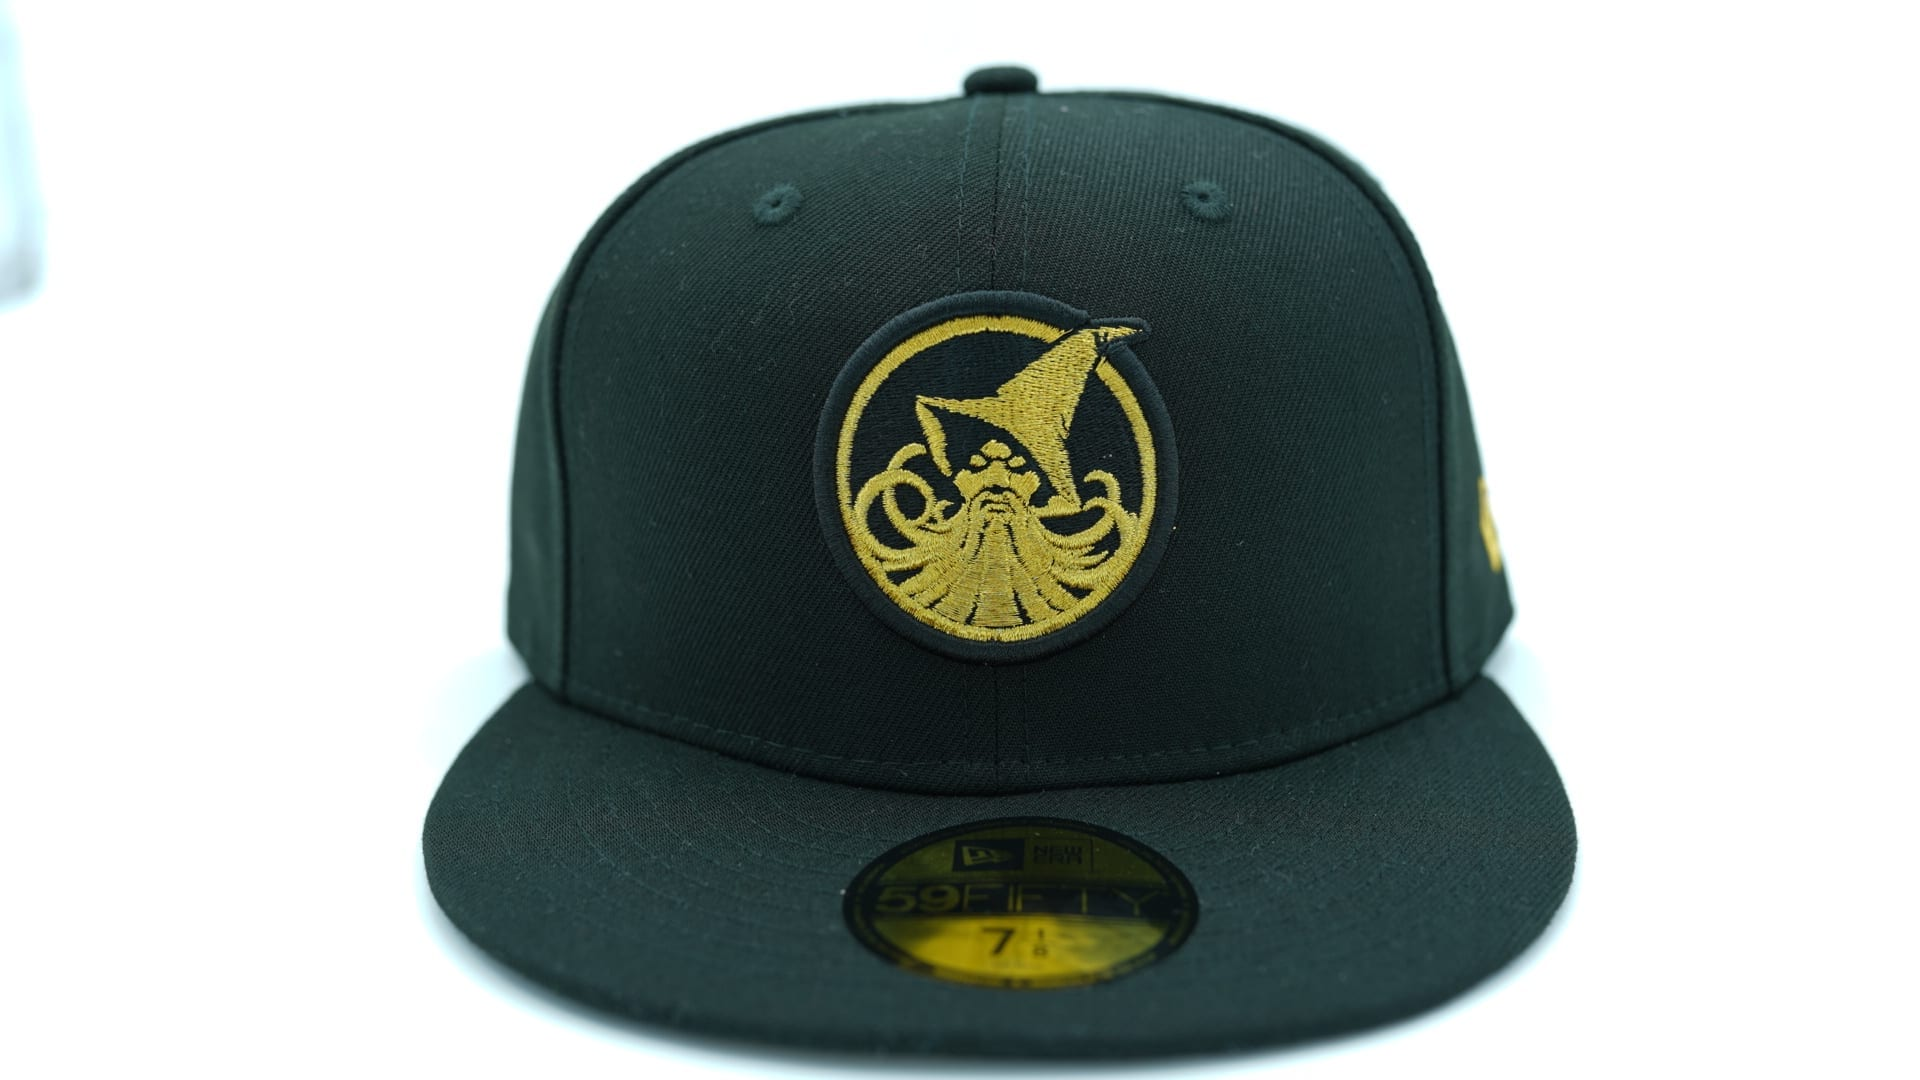 official texas longhorn baseball cap caps uk longhorns stadium capacity side filler fitted era